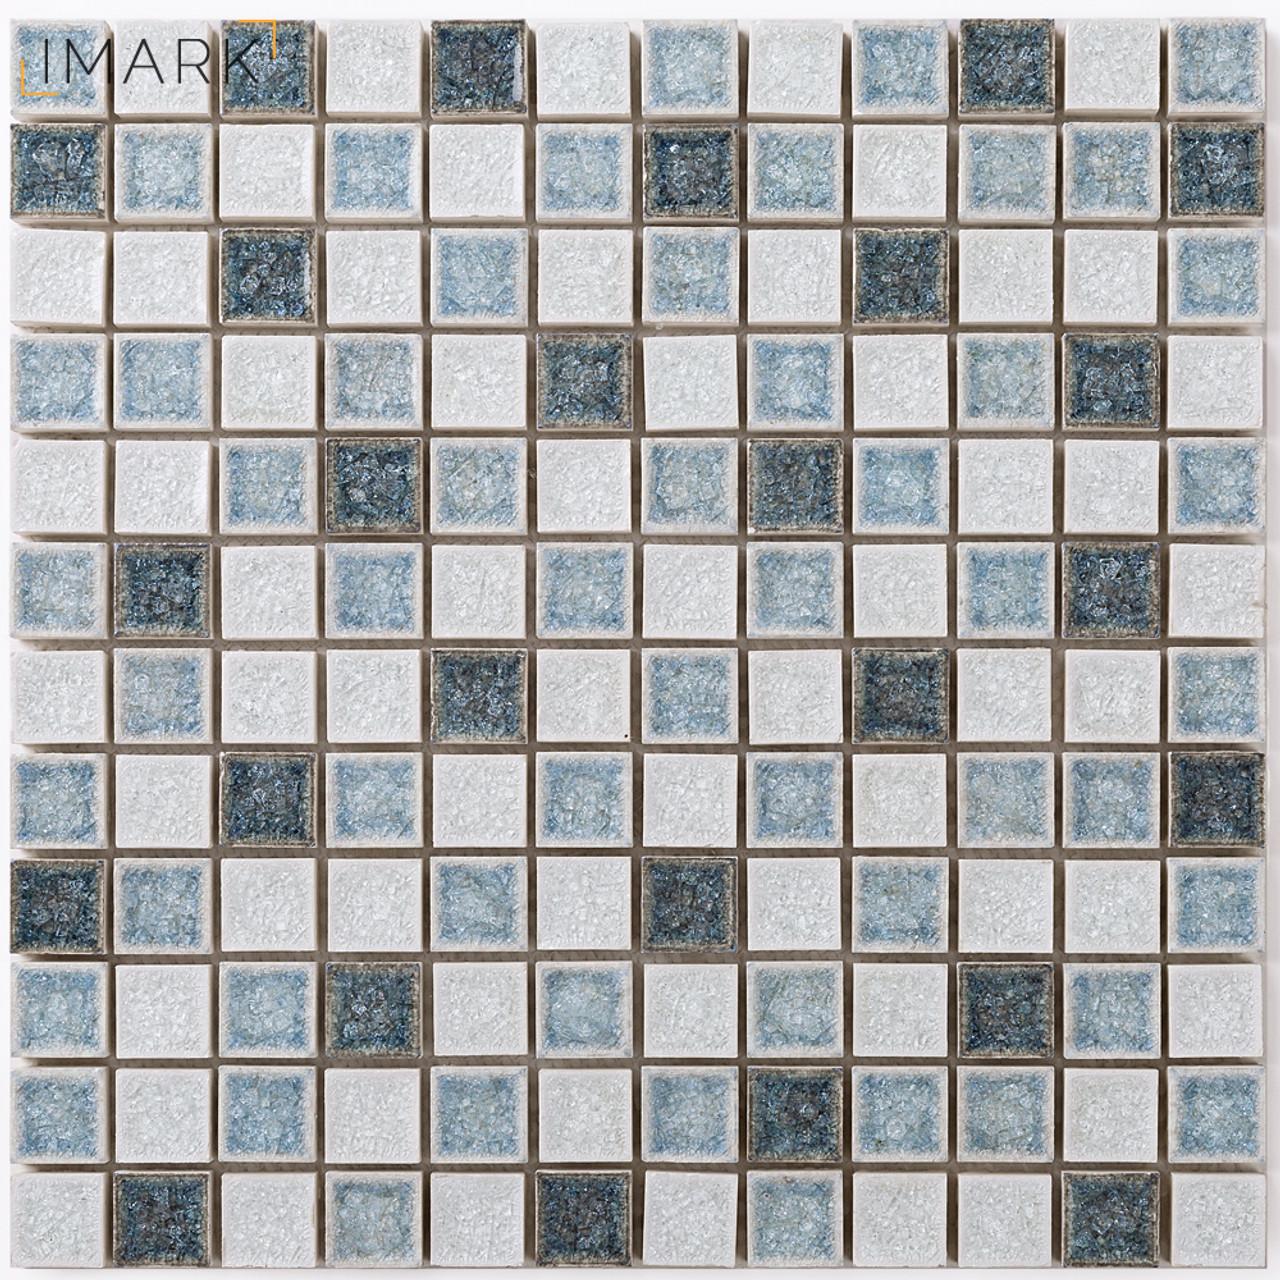 IMARK Frozen Crackle Glaze Ceramic Mosaic Tile Decor Kitchen